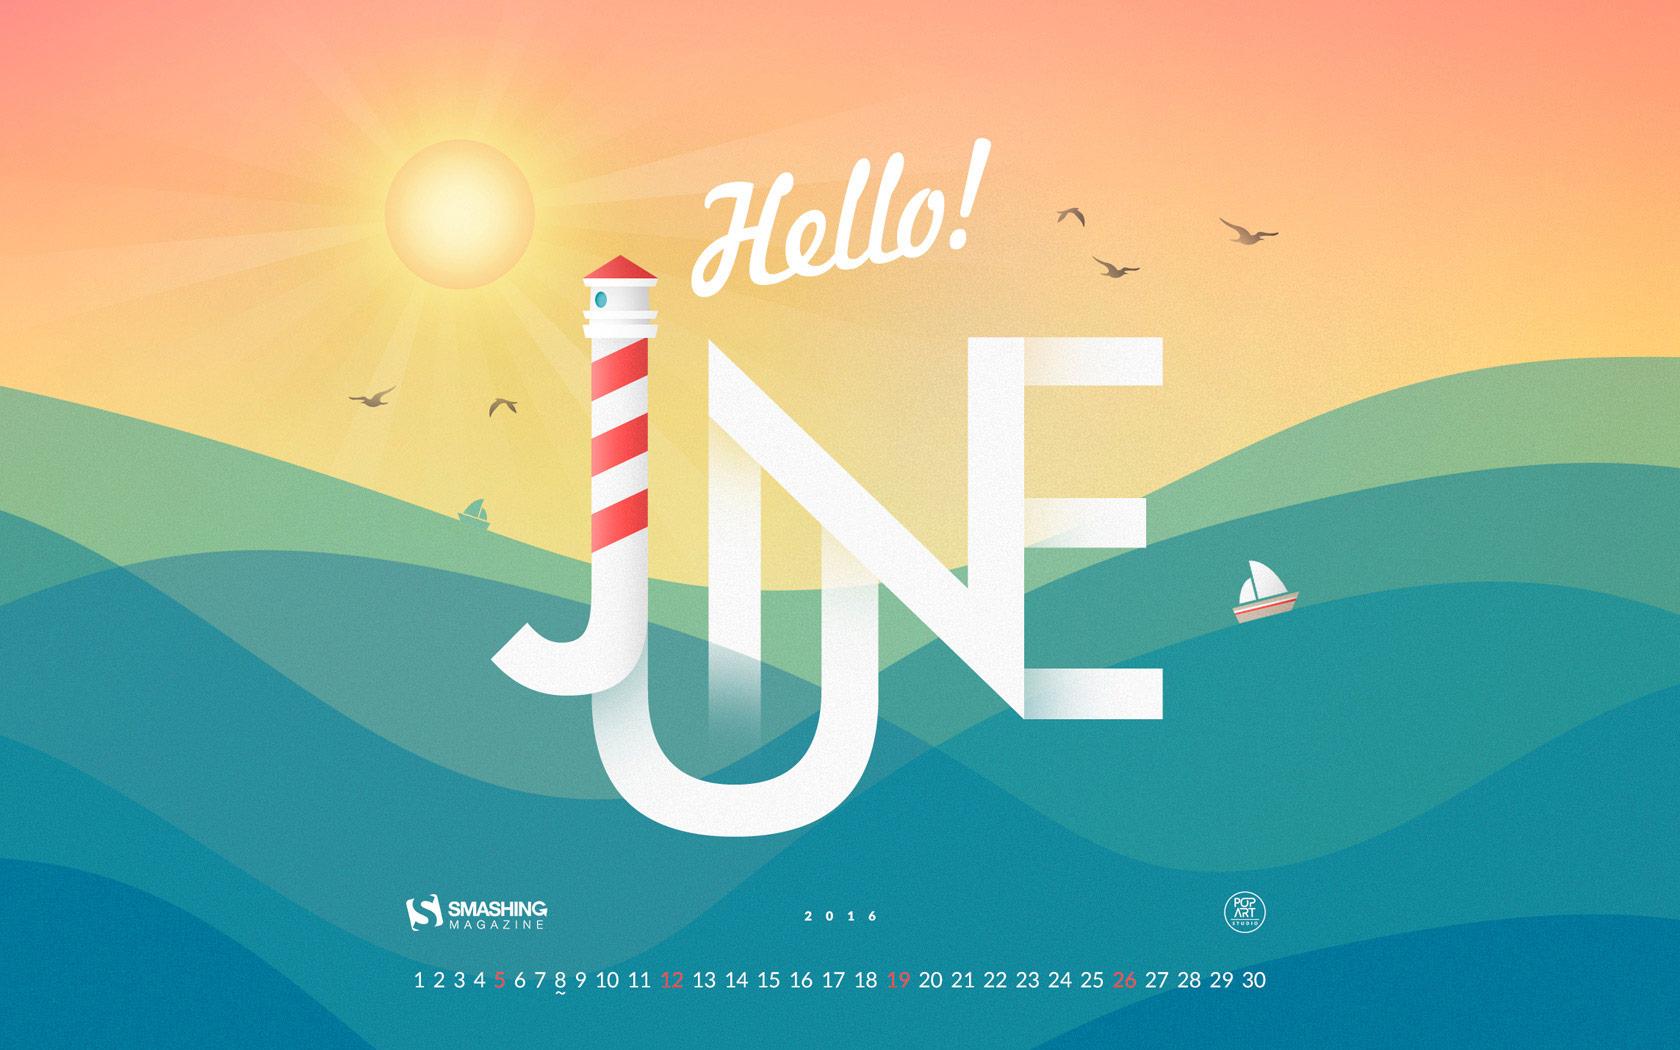 Desktop Wallpaper Calendars June 2016 Smashing Magazine 1680x1050